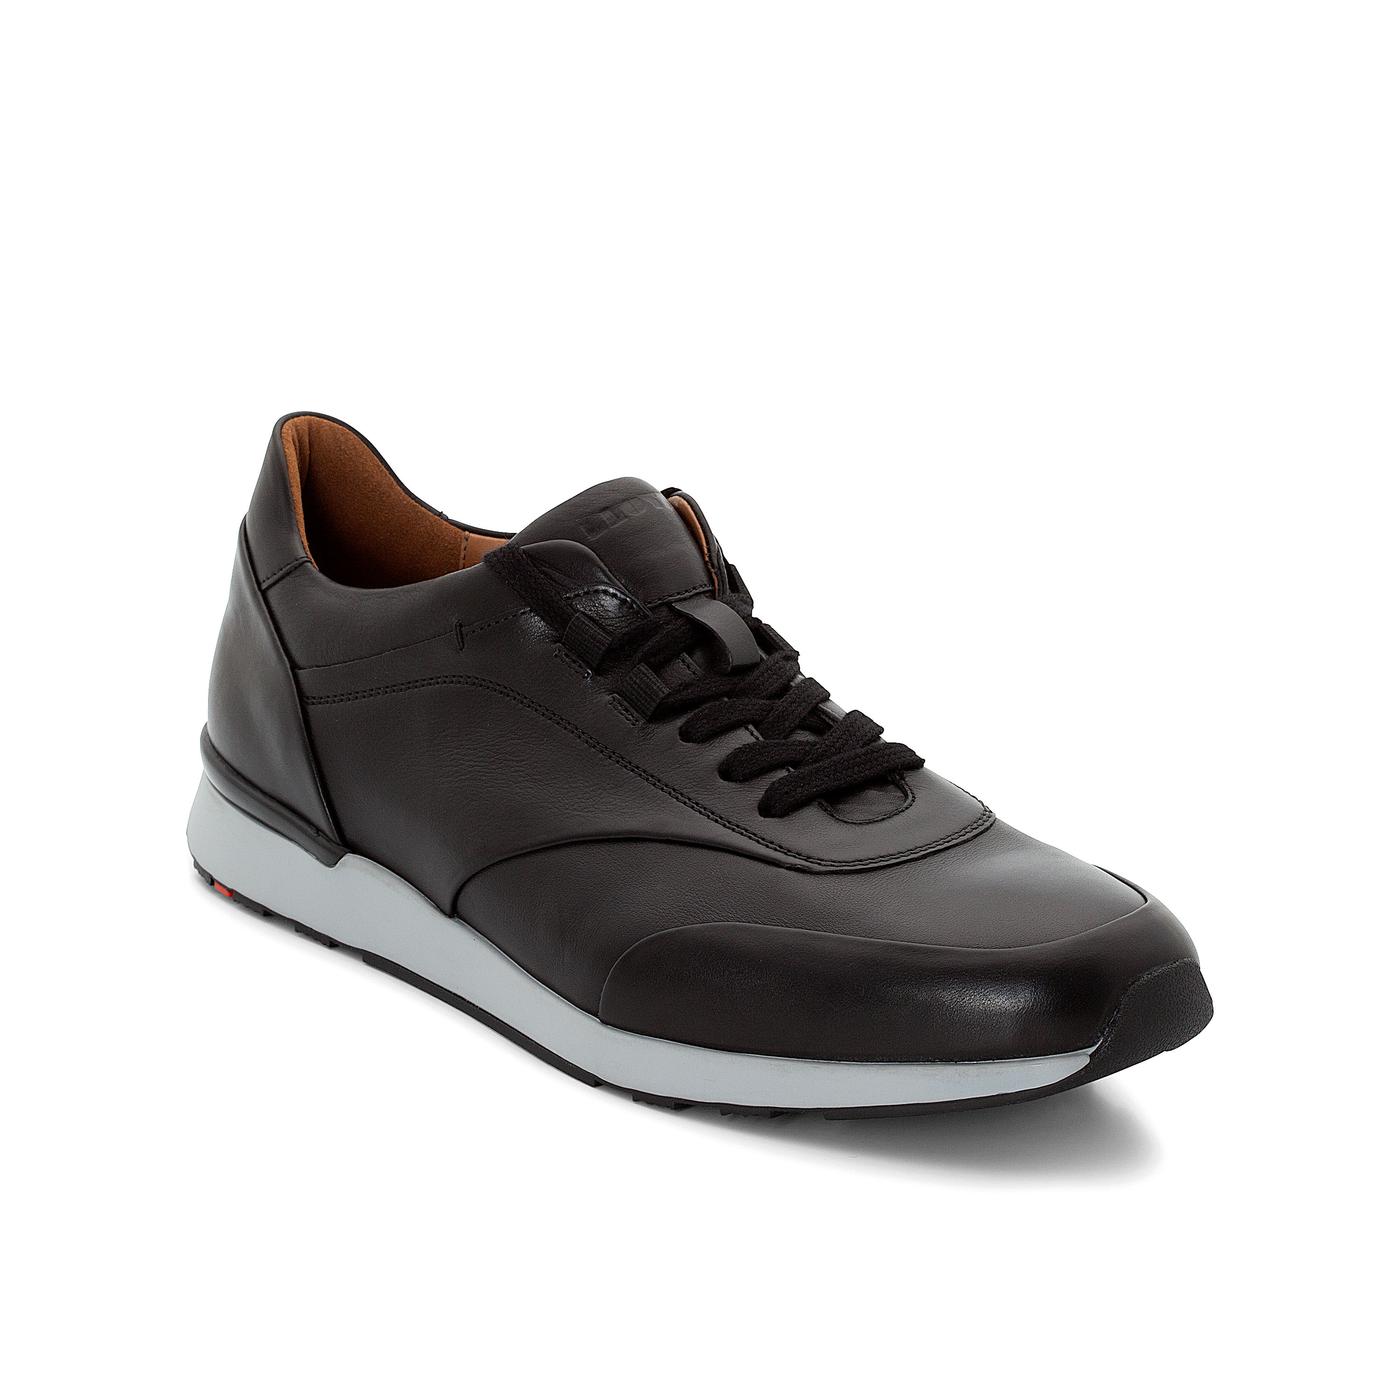 AJAS | Schuhe > Sneaker > Sneaker high | Lloyd